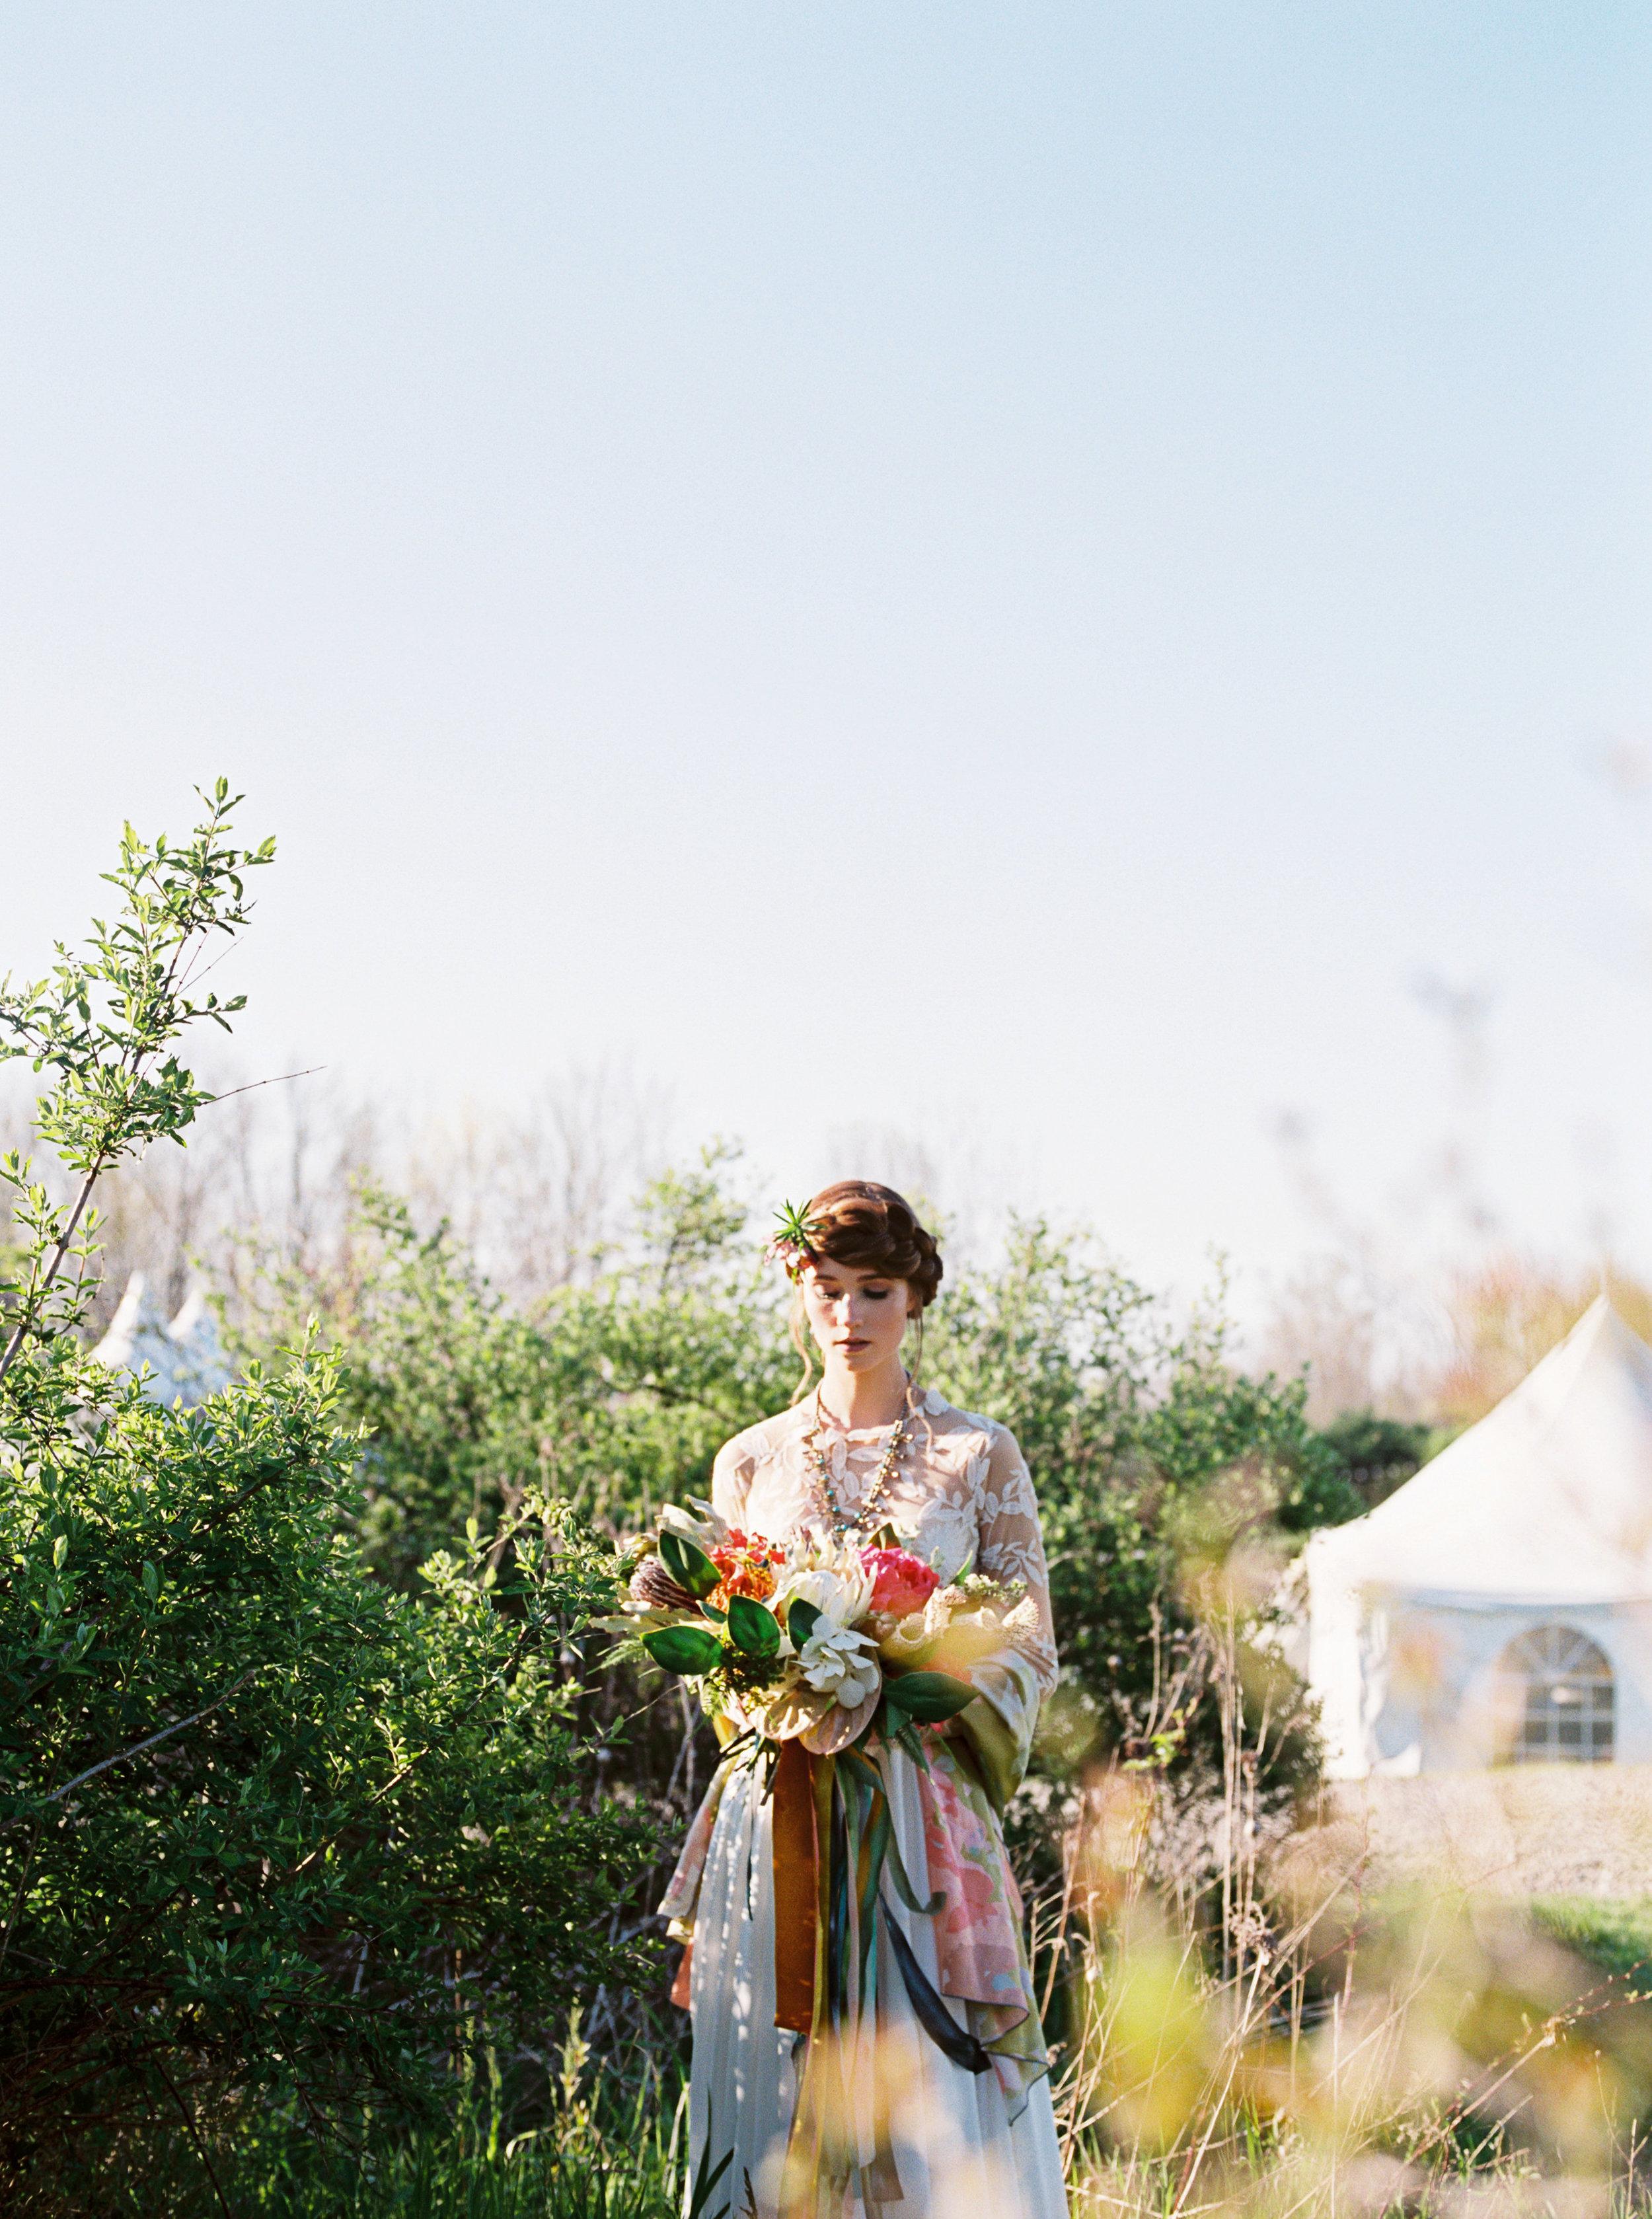 Alexandra-Elise-Photography-Ali-Reed-Film-Wedding-Photographer-Ithaca-New-York-Firelight-Camps-049.jpg